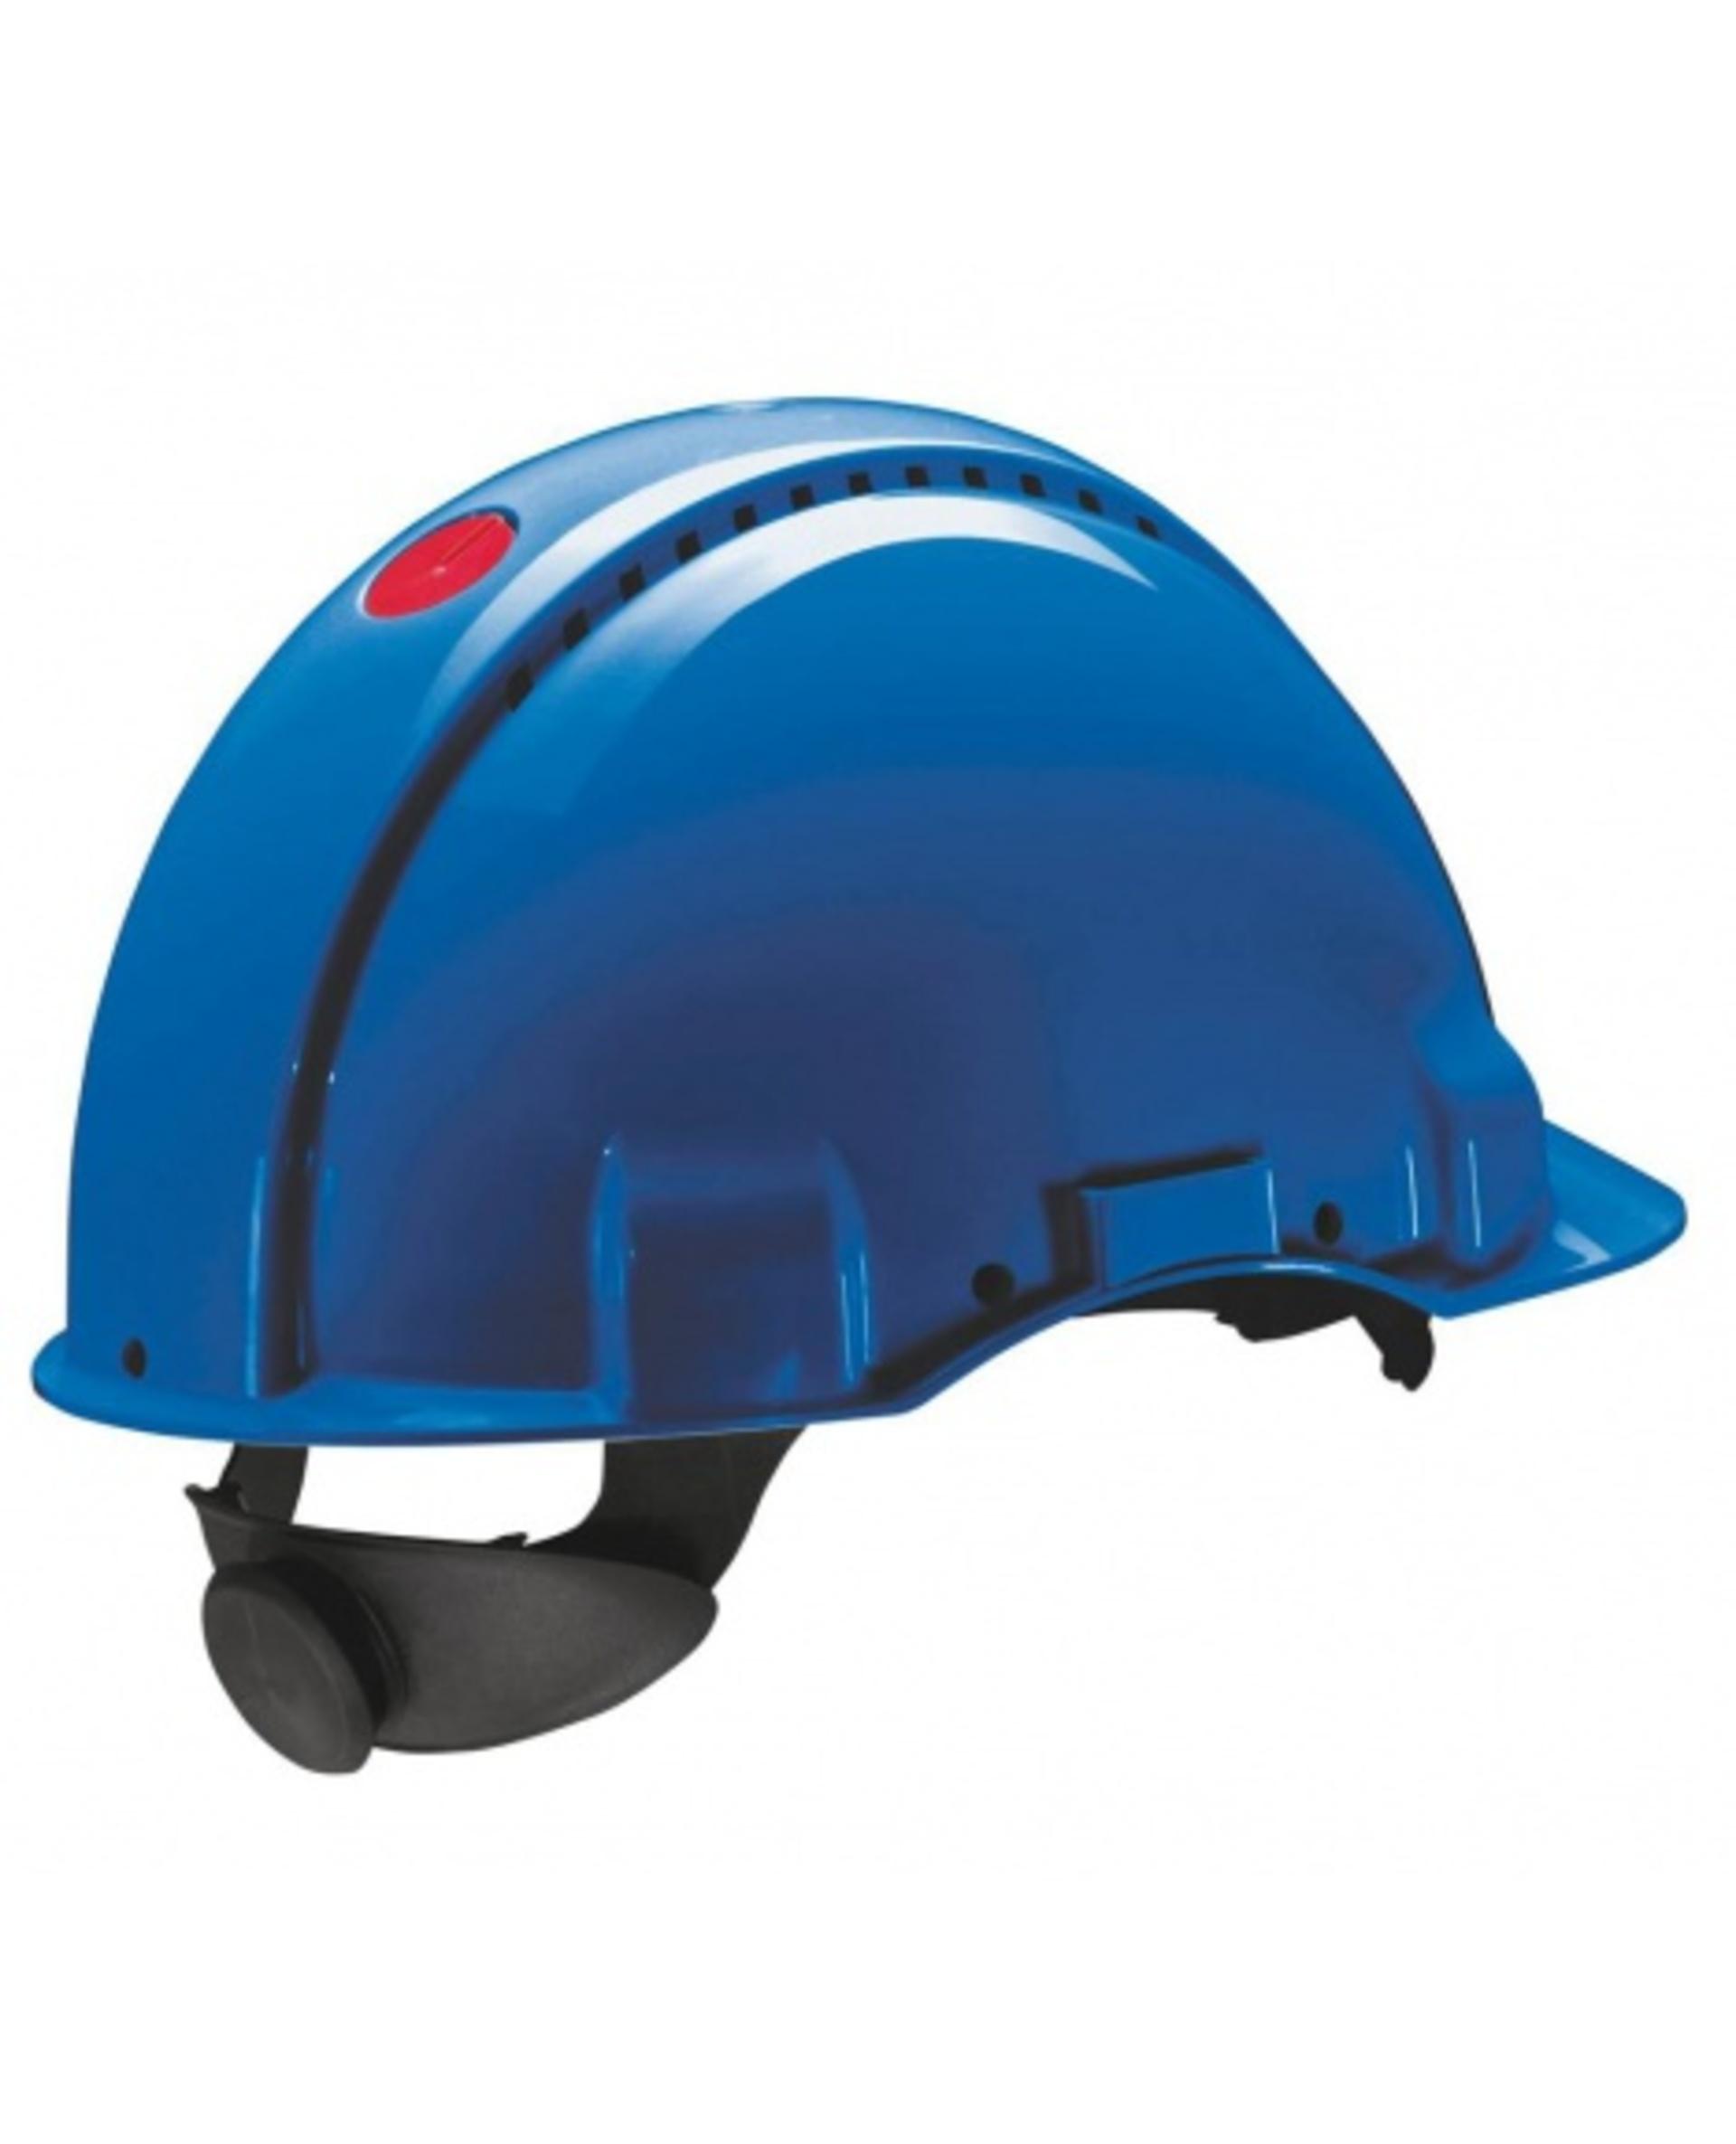 3M PELTOR G3000 Ochranná přilba modrá